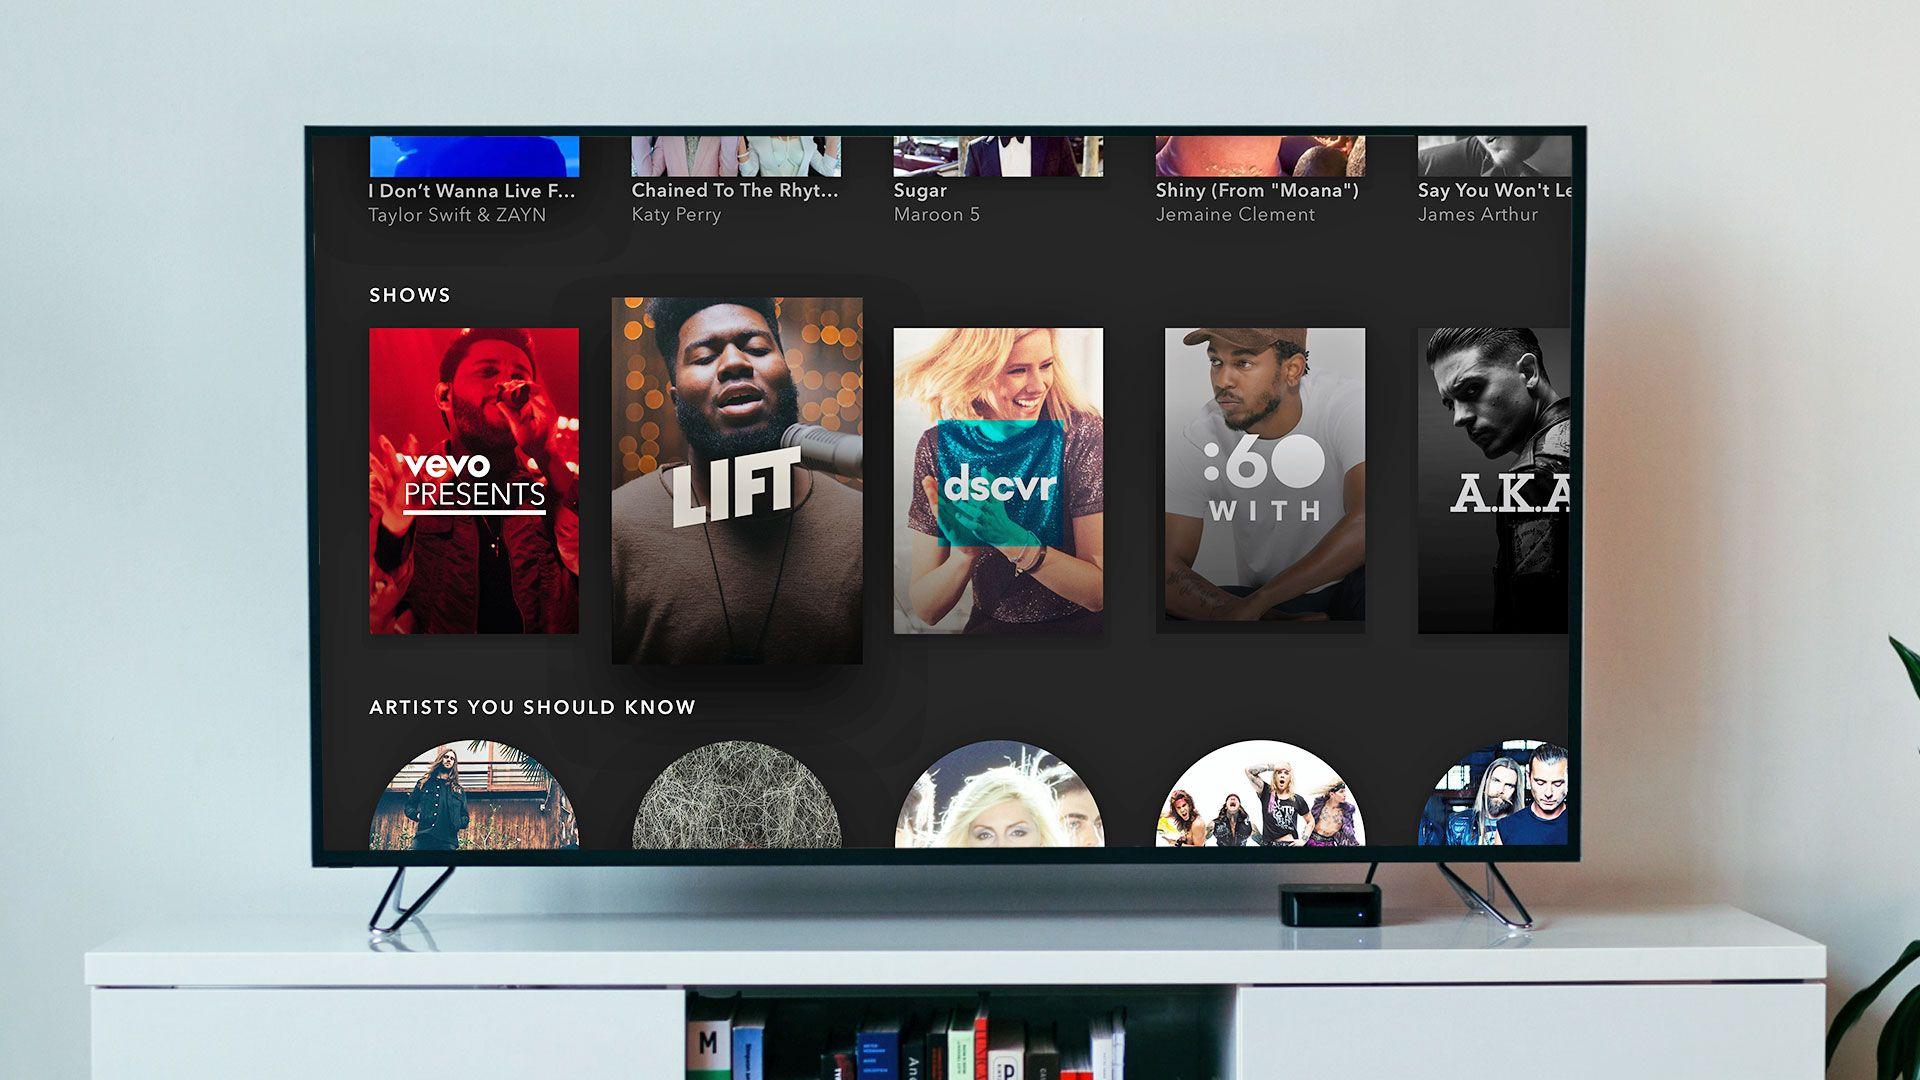 Vevo's Apple TV app takes cues from Spotify Tv app